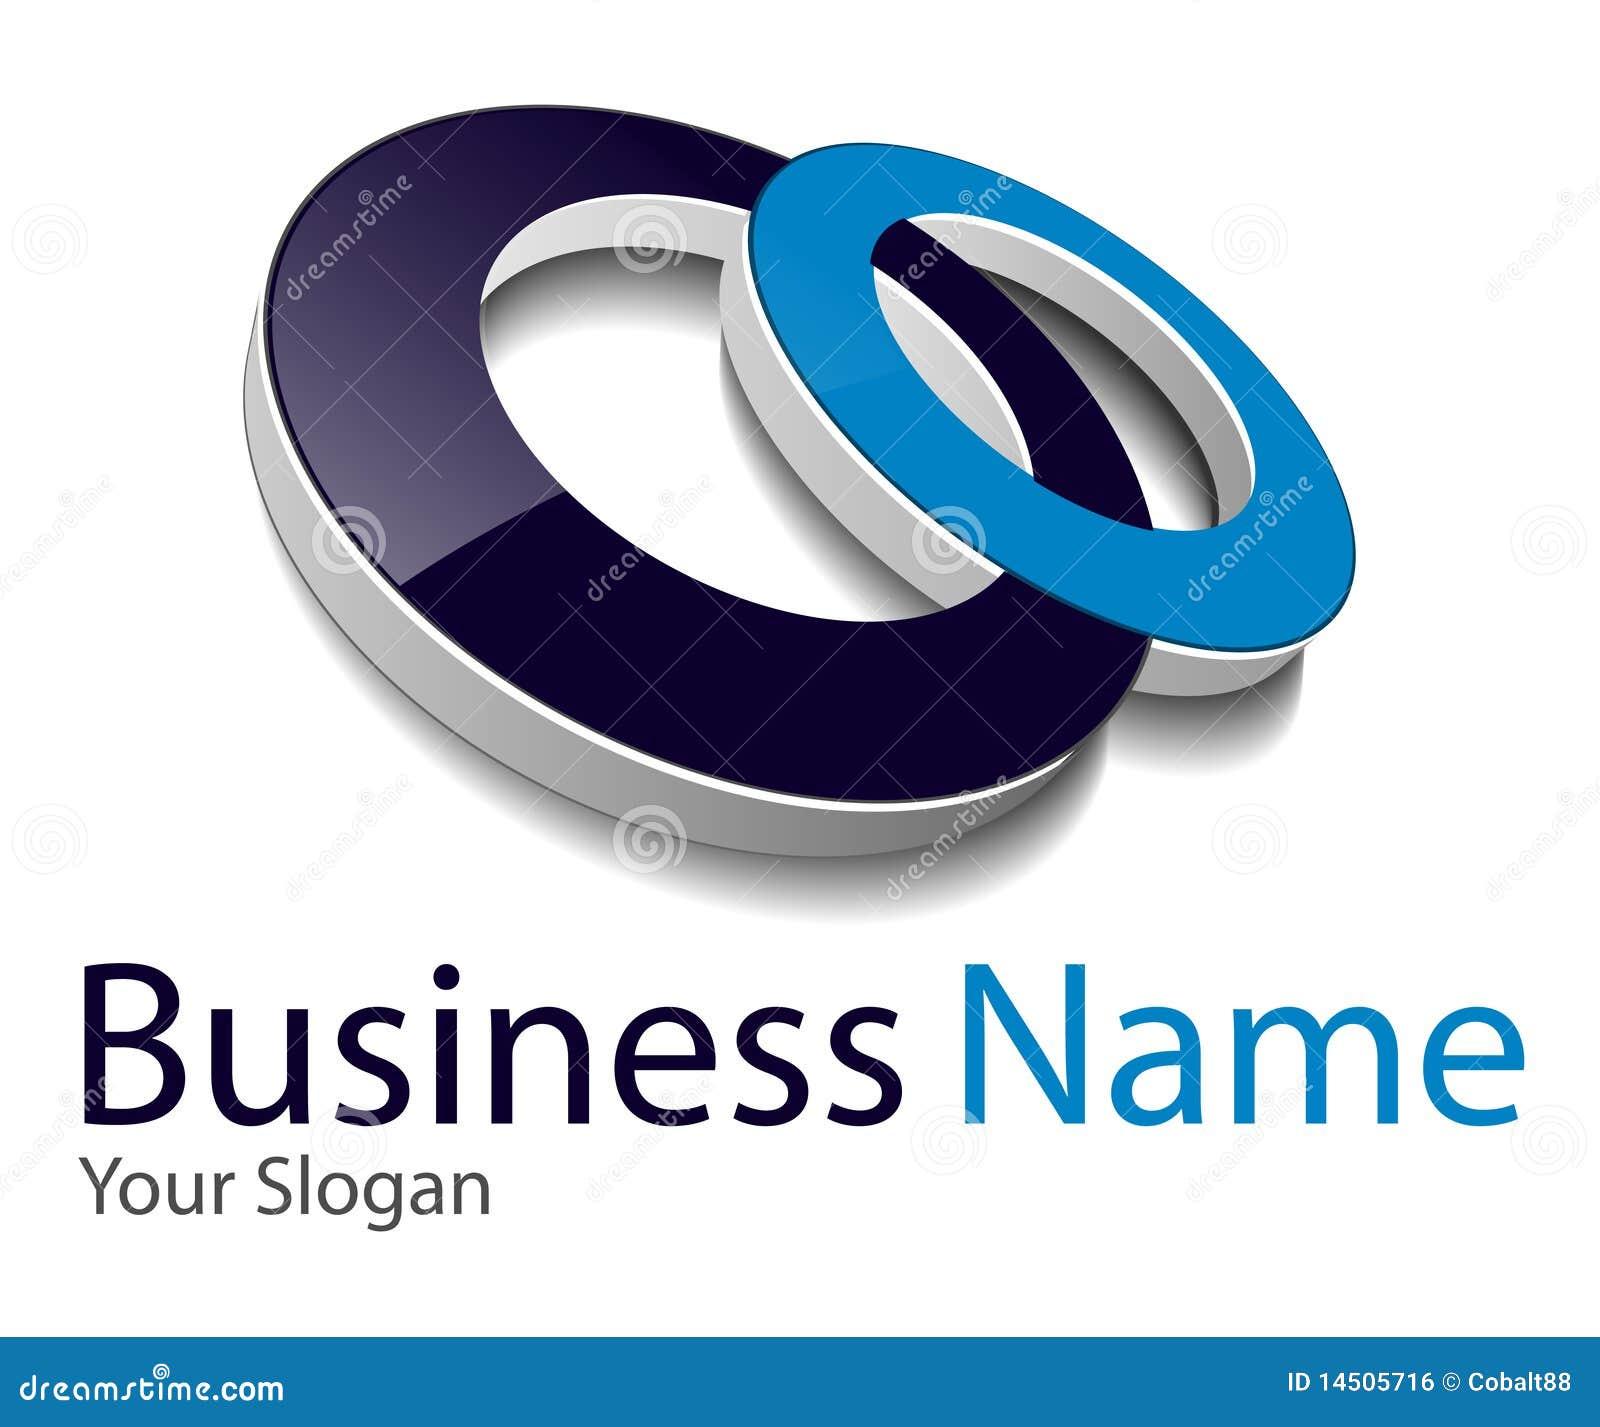 logo 3d royalty free stock image image 14505716